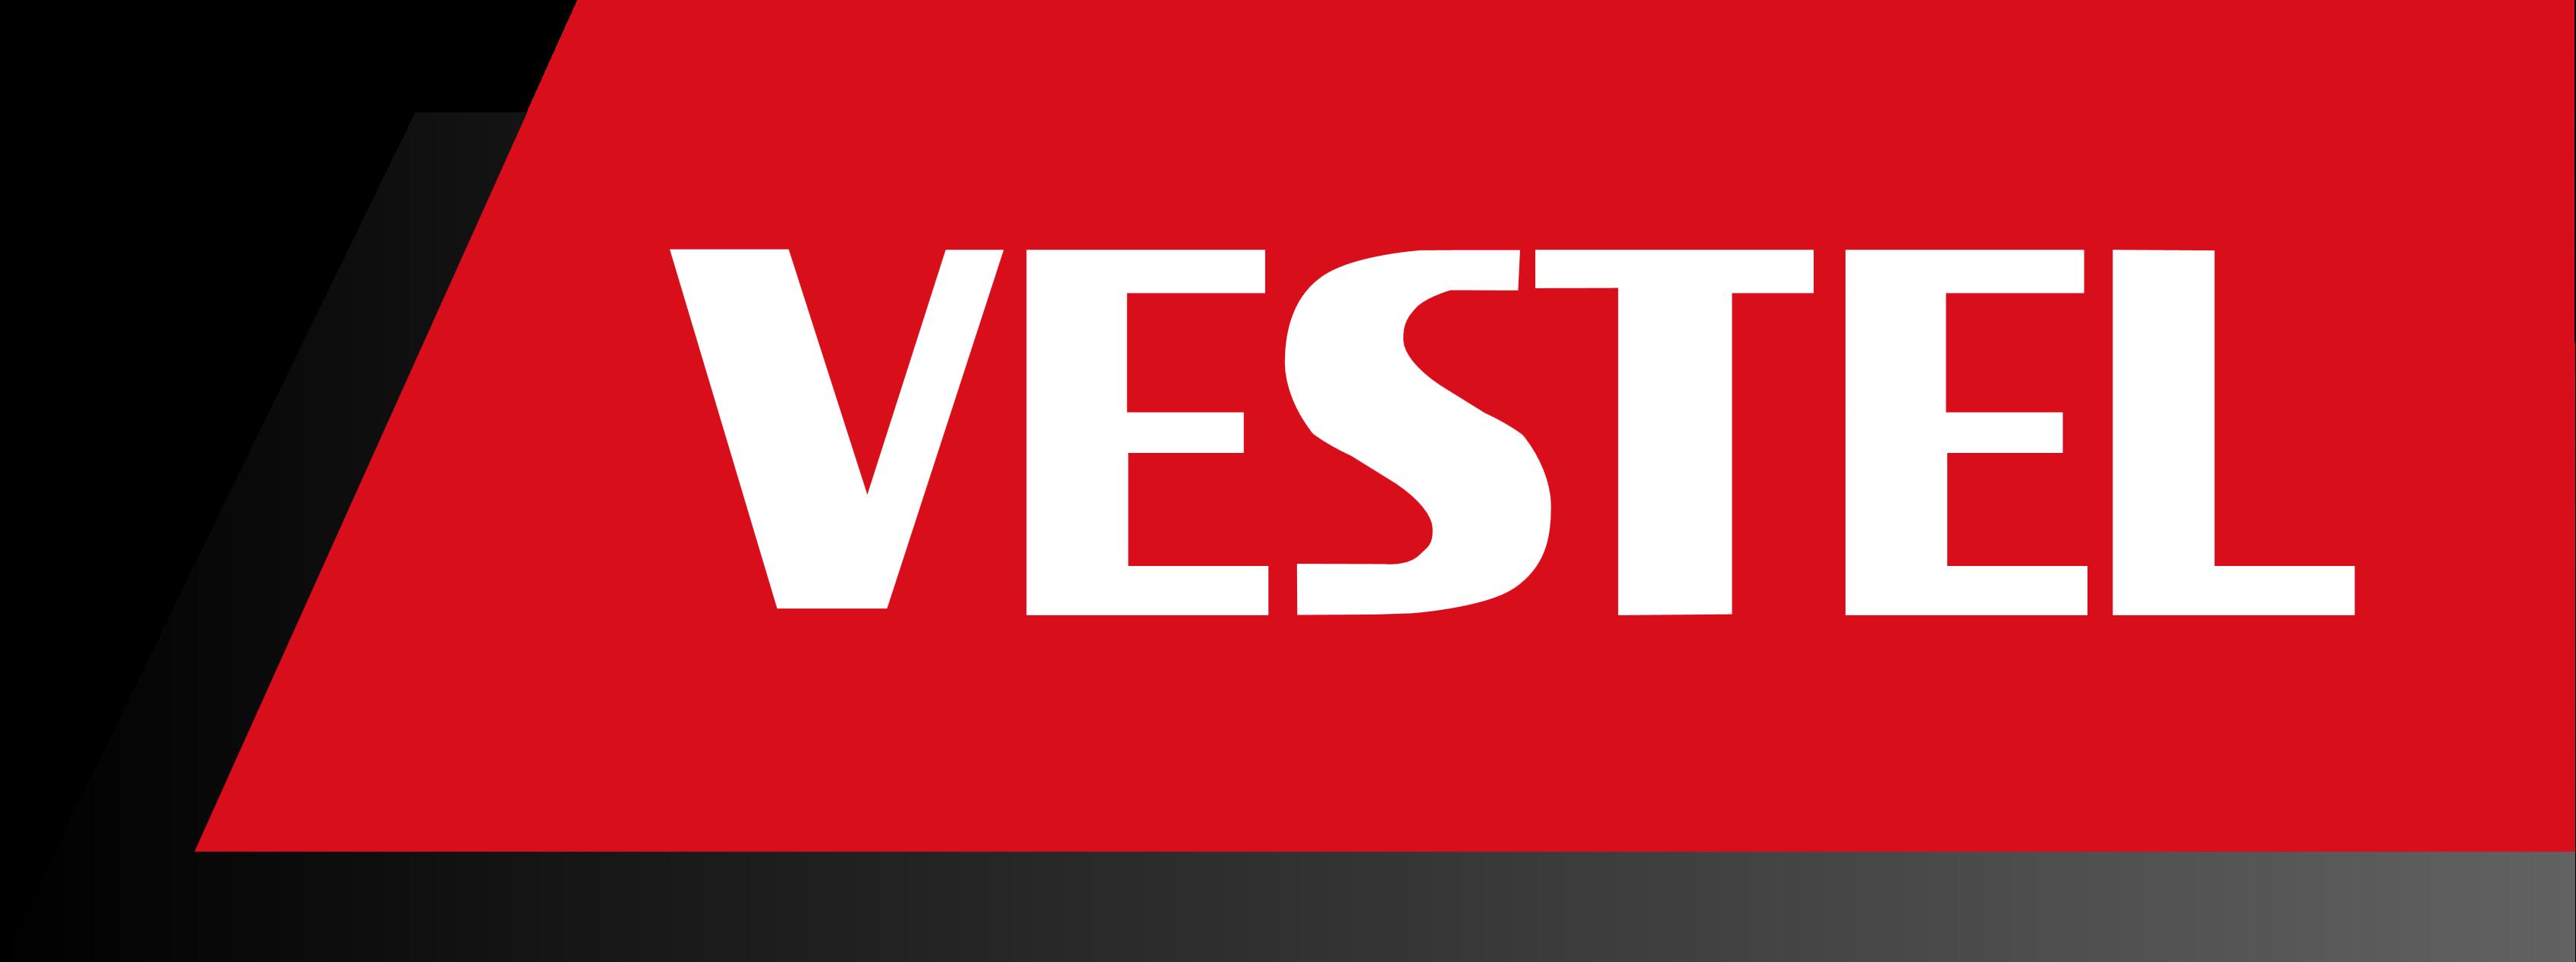 Vestel Logos Download